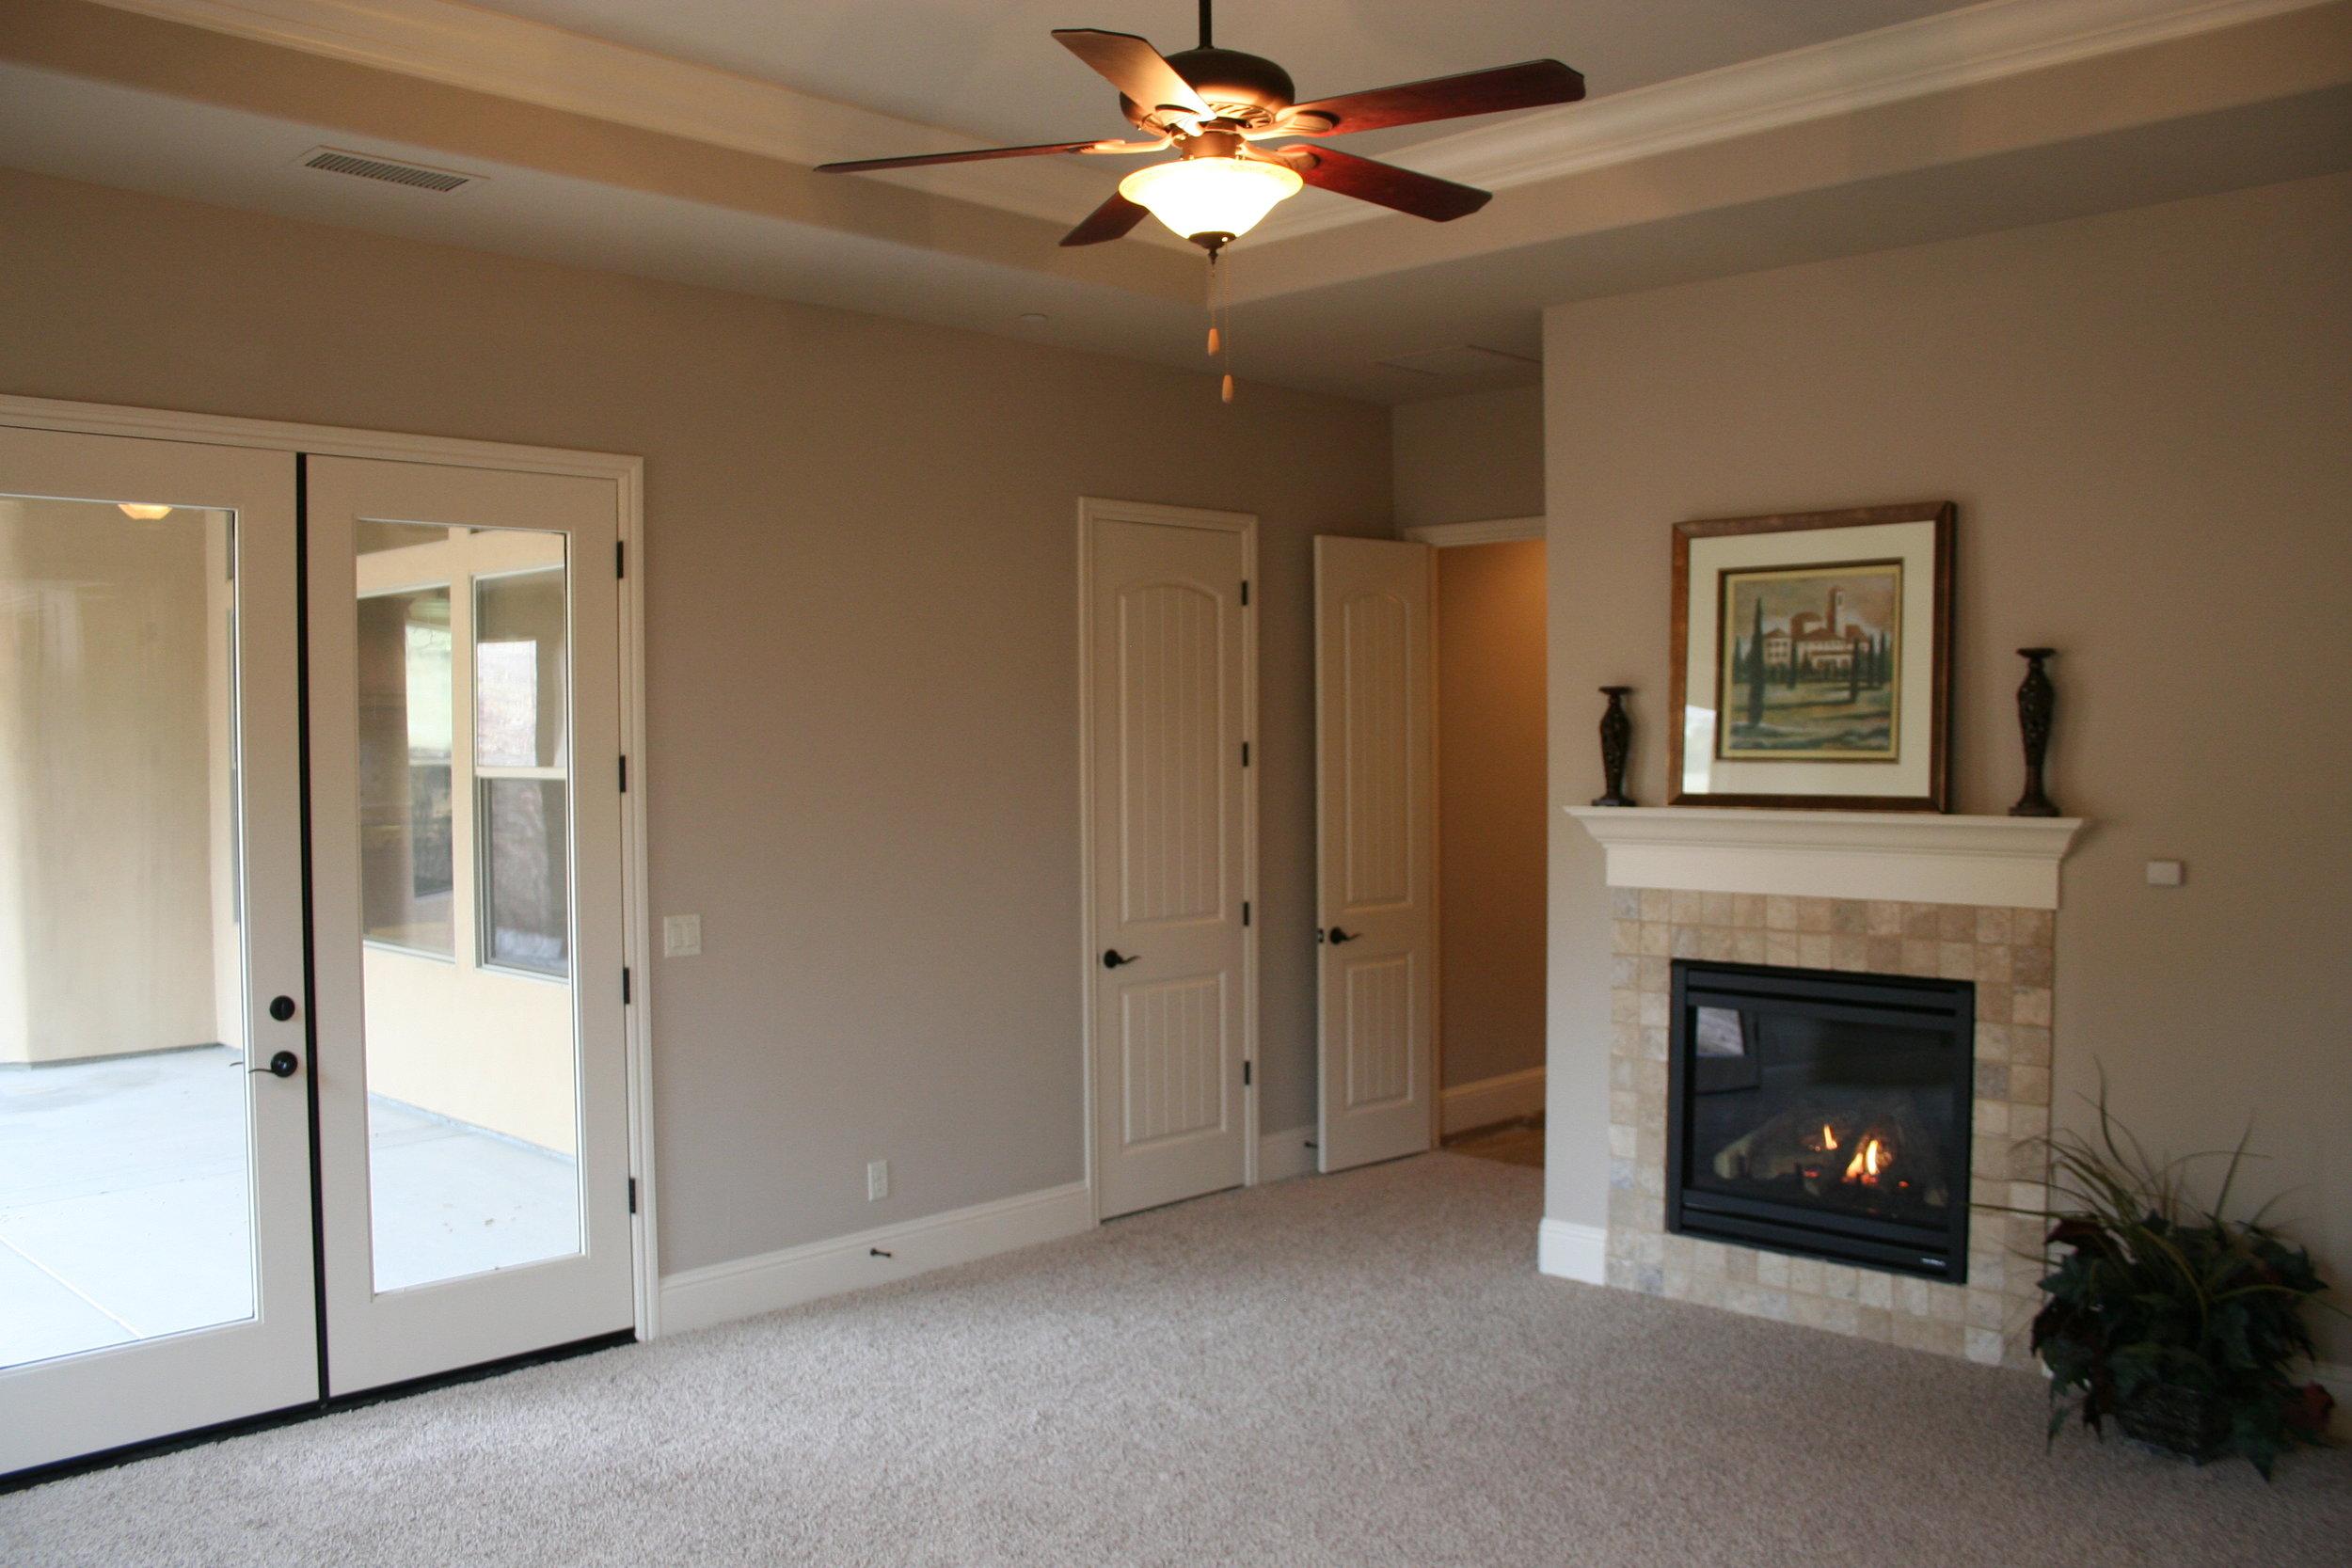 84-master bedroom fireplace.JPG